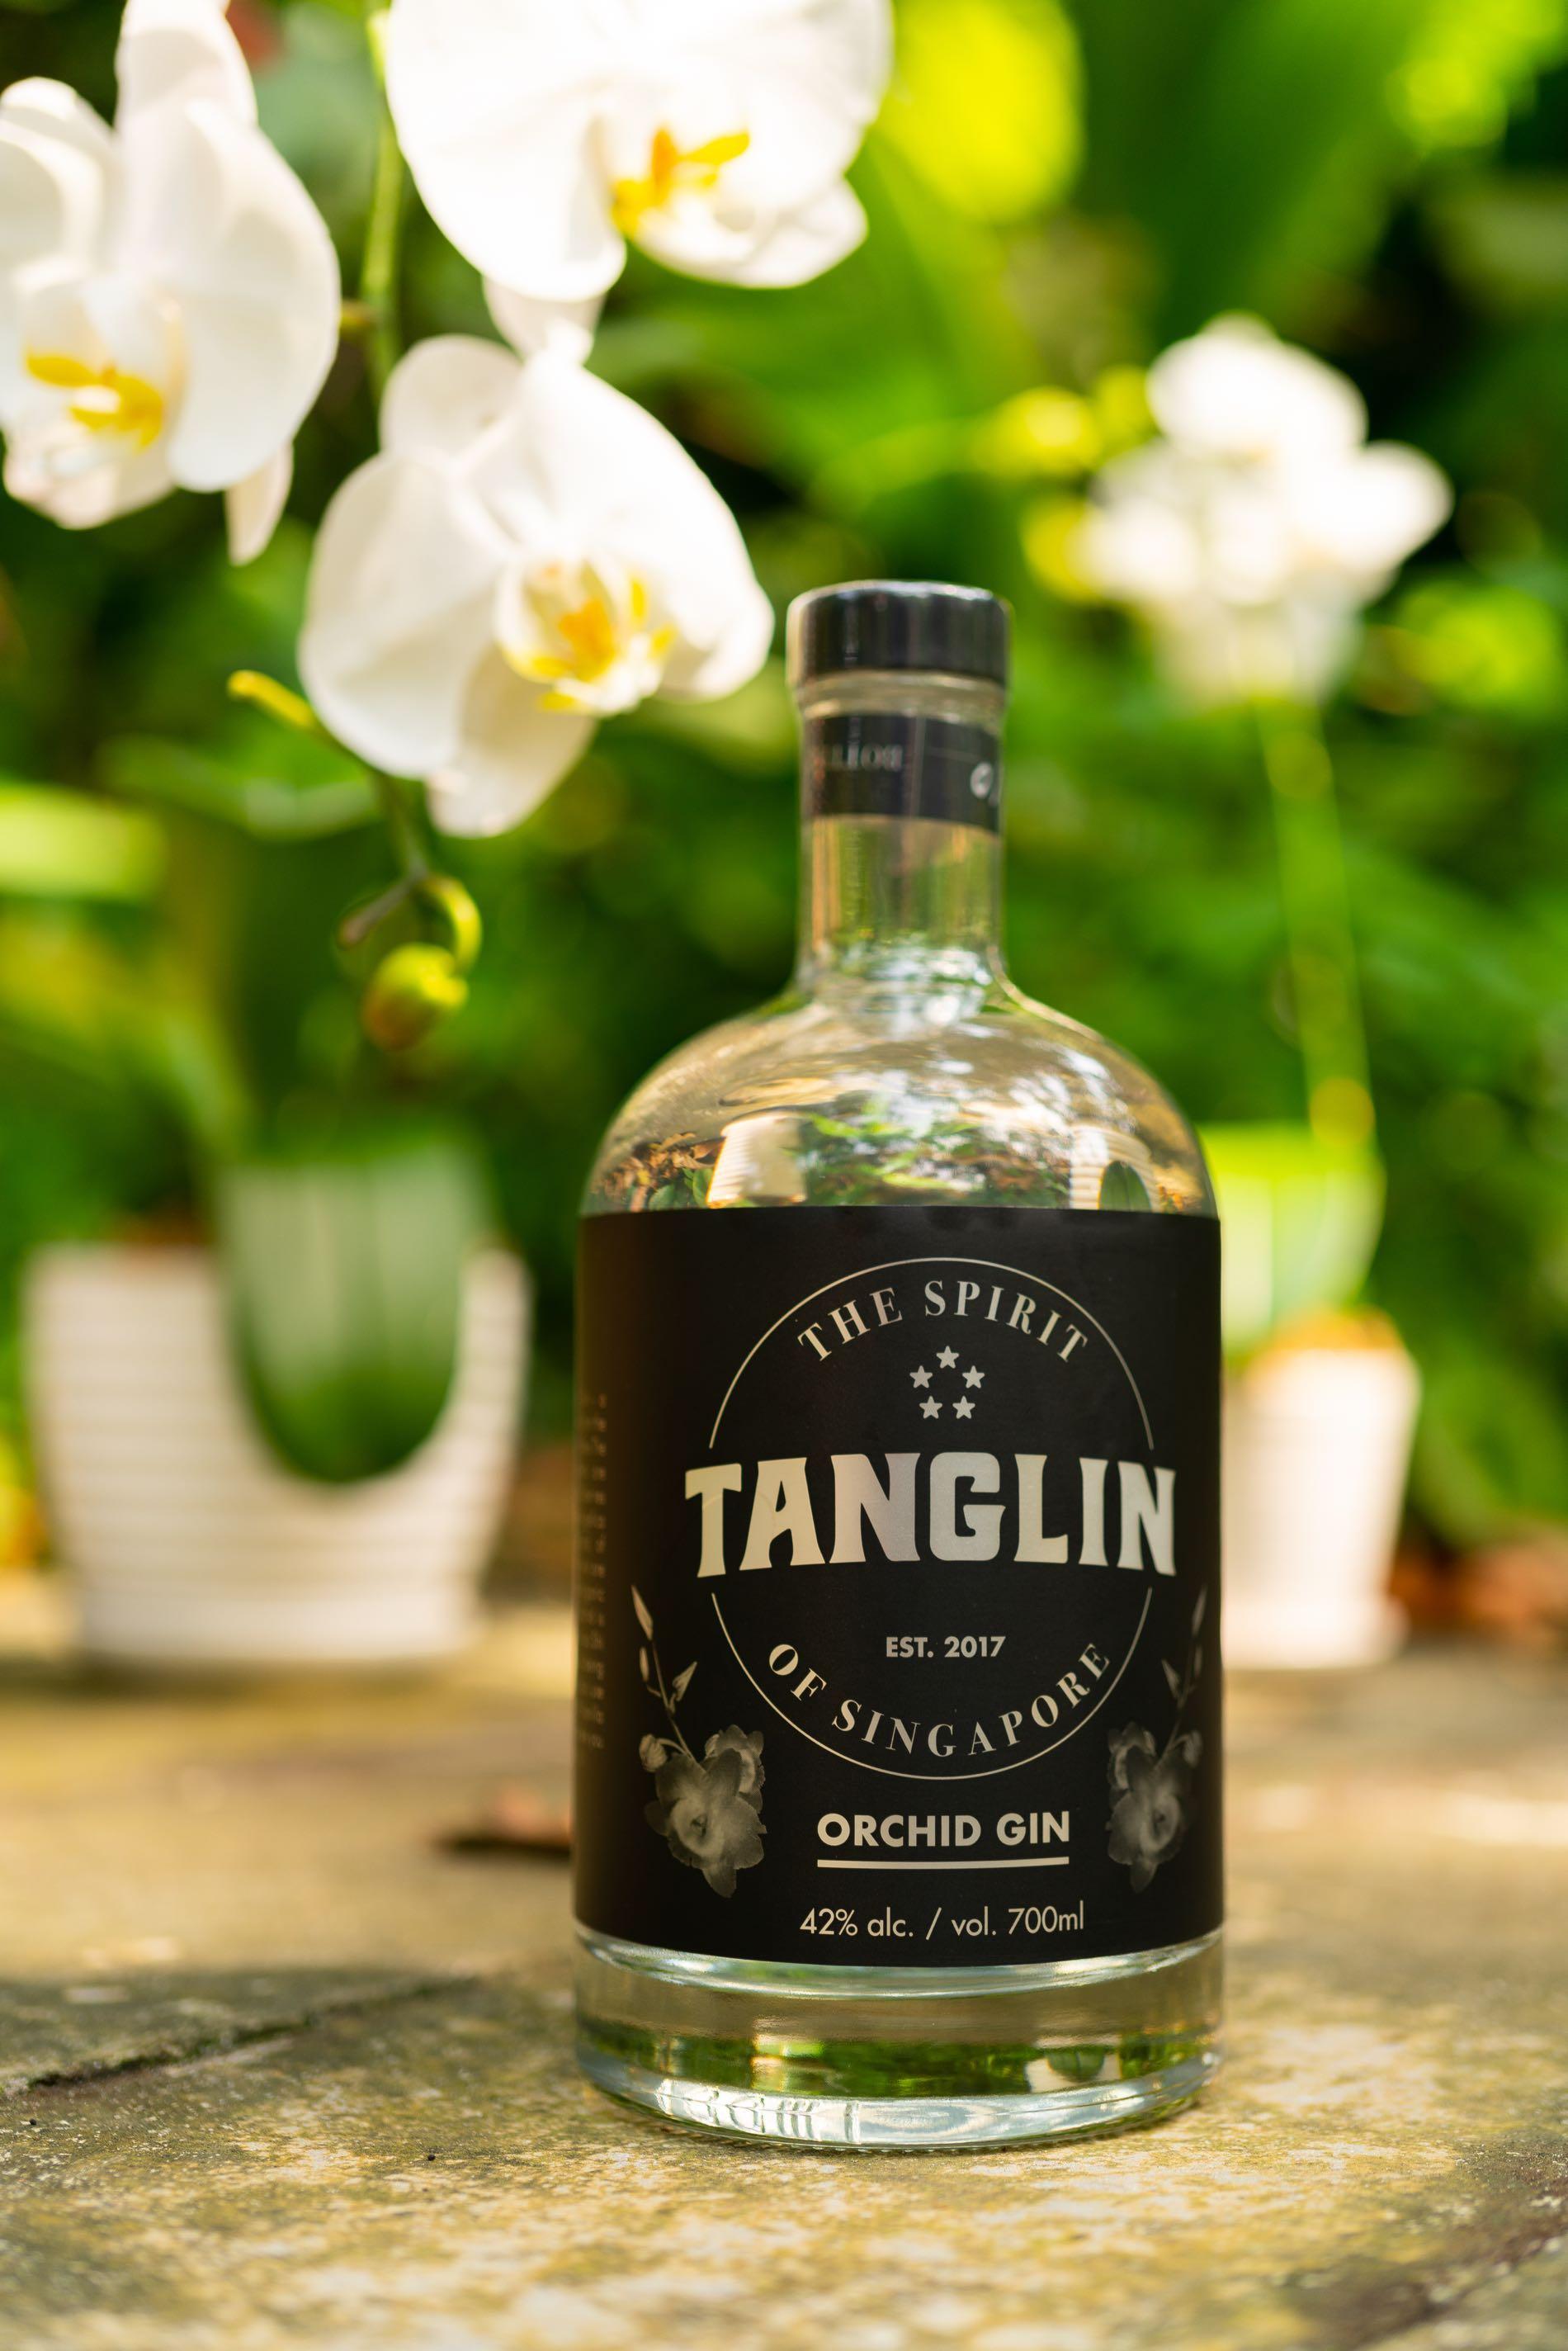 Singapore S Tanglin Gin Wins Silver At Cathay Pacific Hong